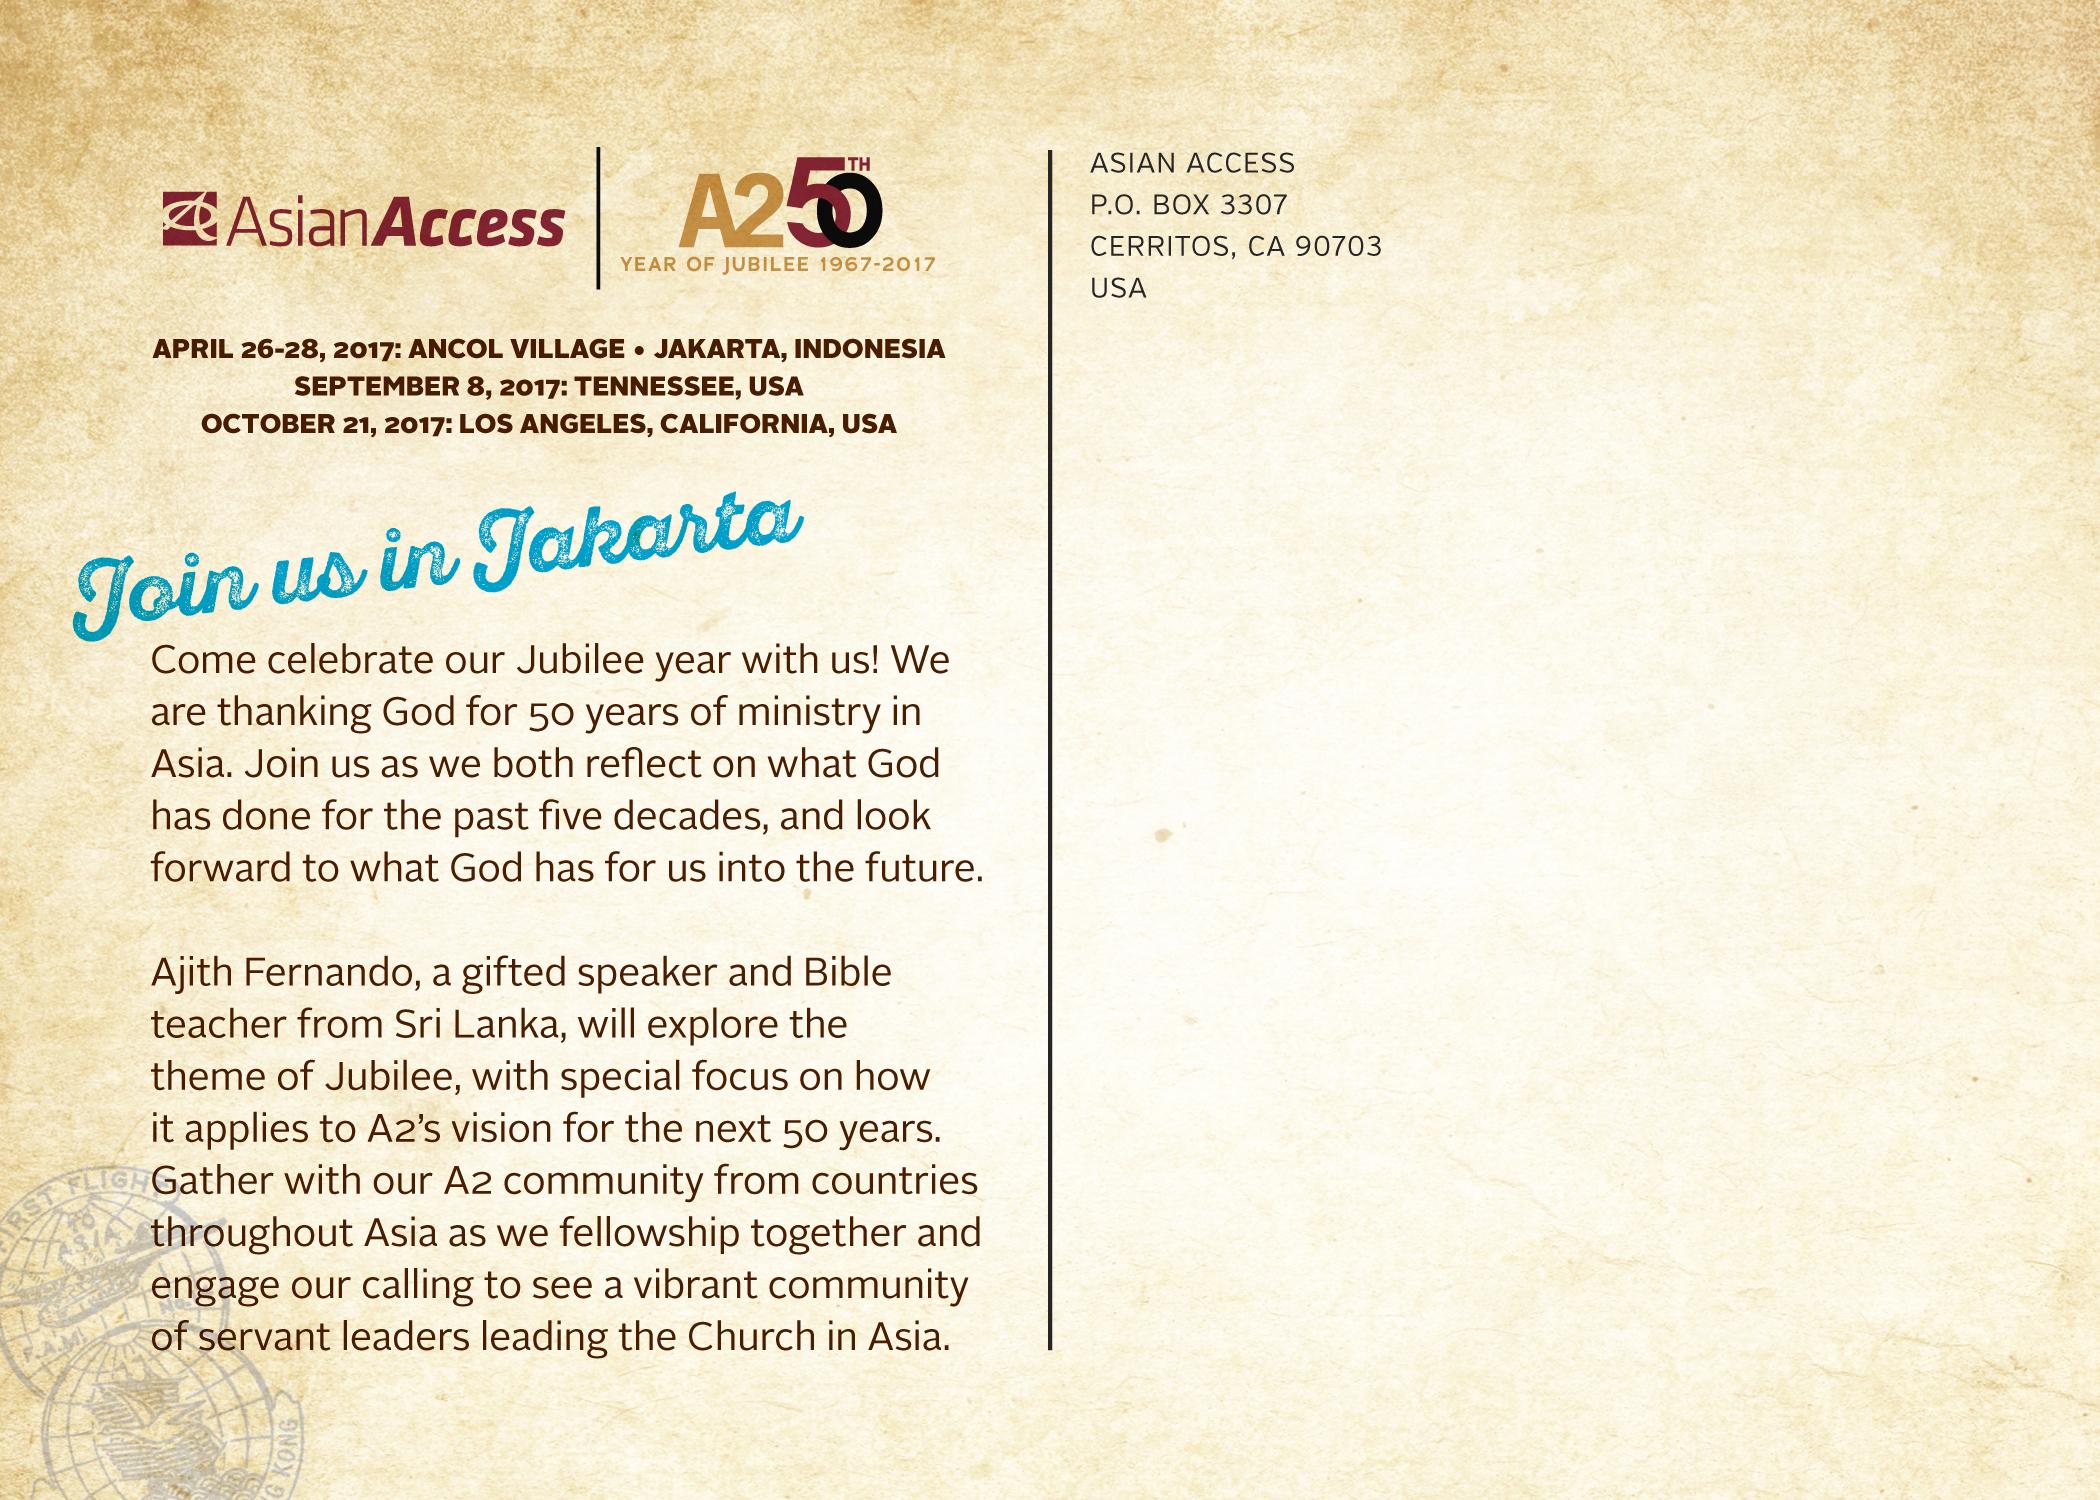 asian access invitation to